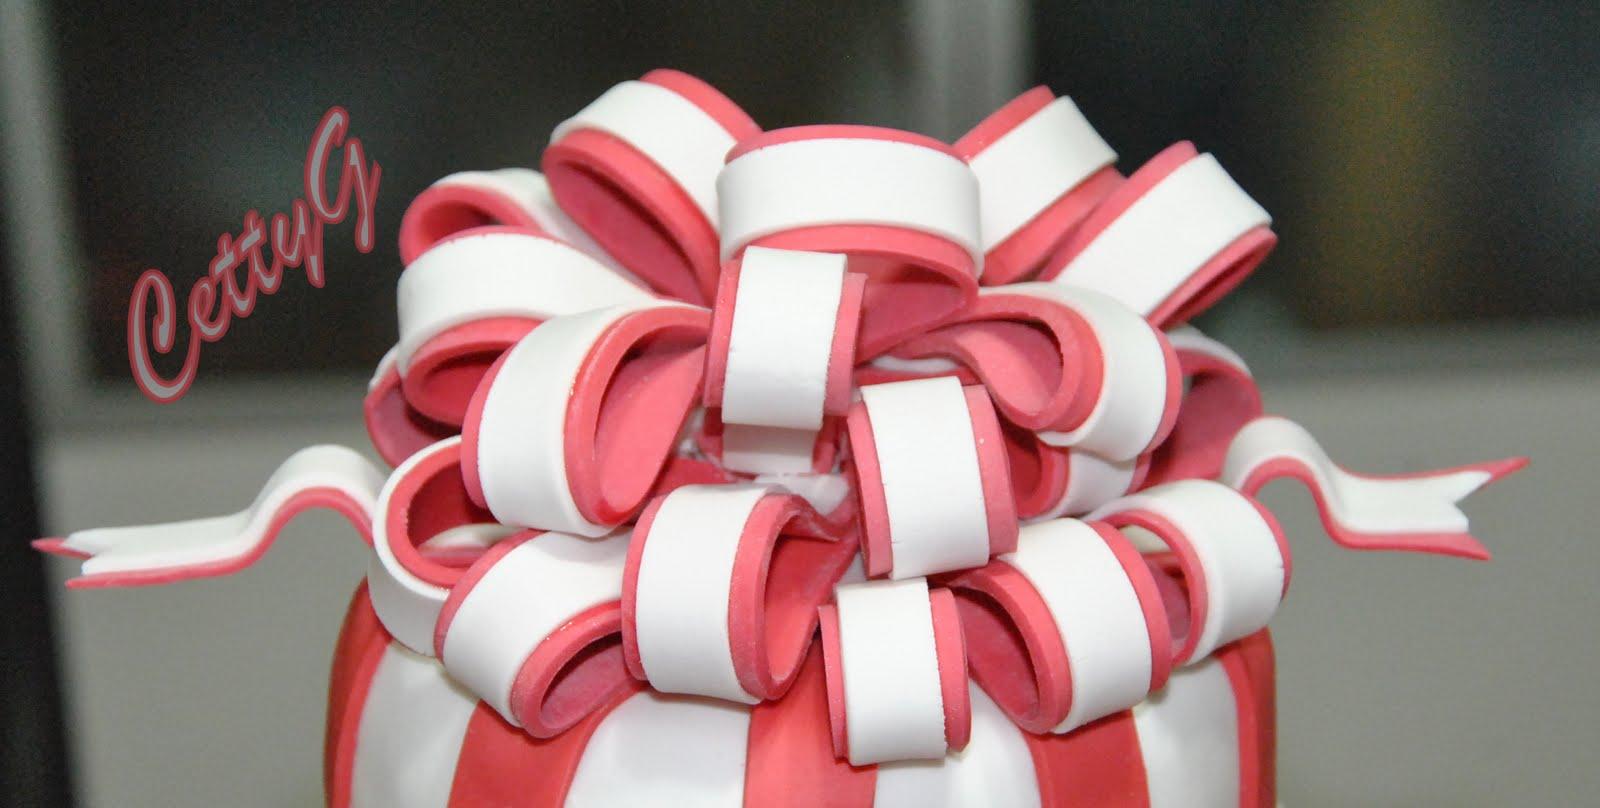 Le torte decorate di cetty g 18 anni in pasta di zucchero for Torte per 18 anni maschile